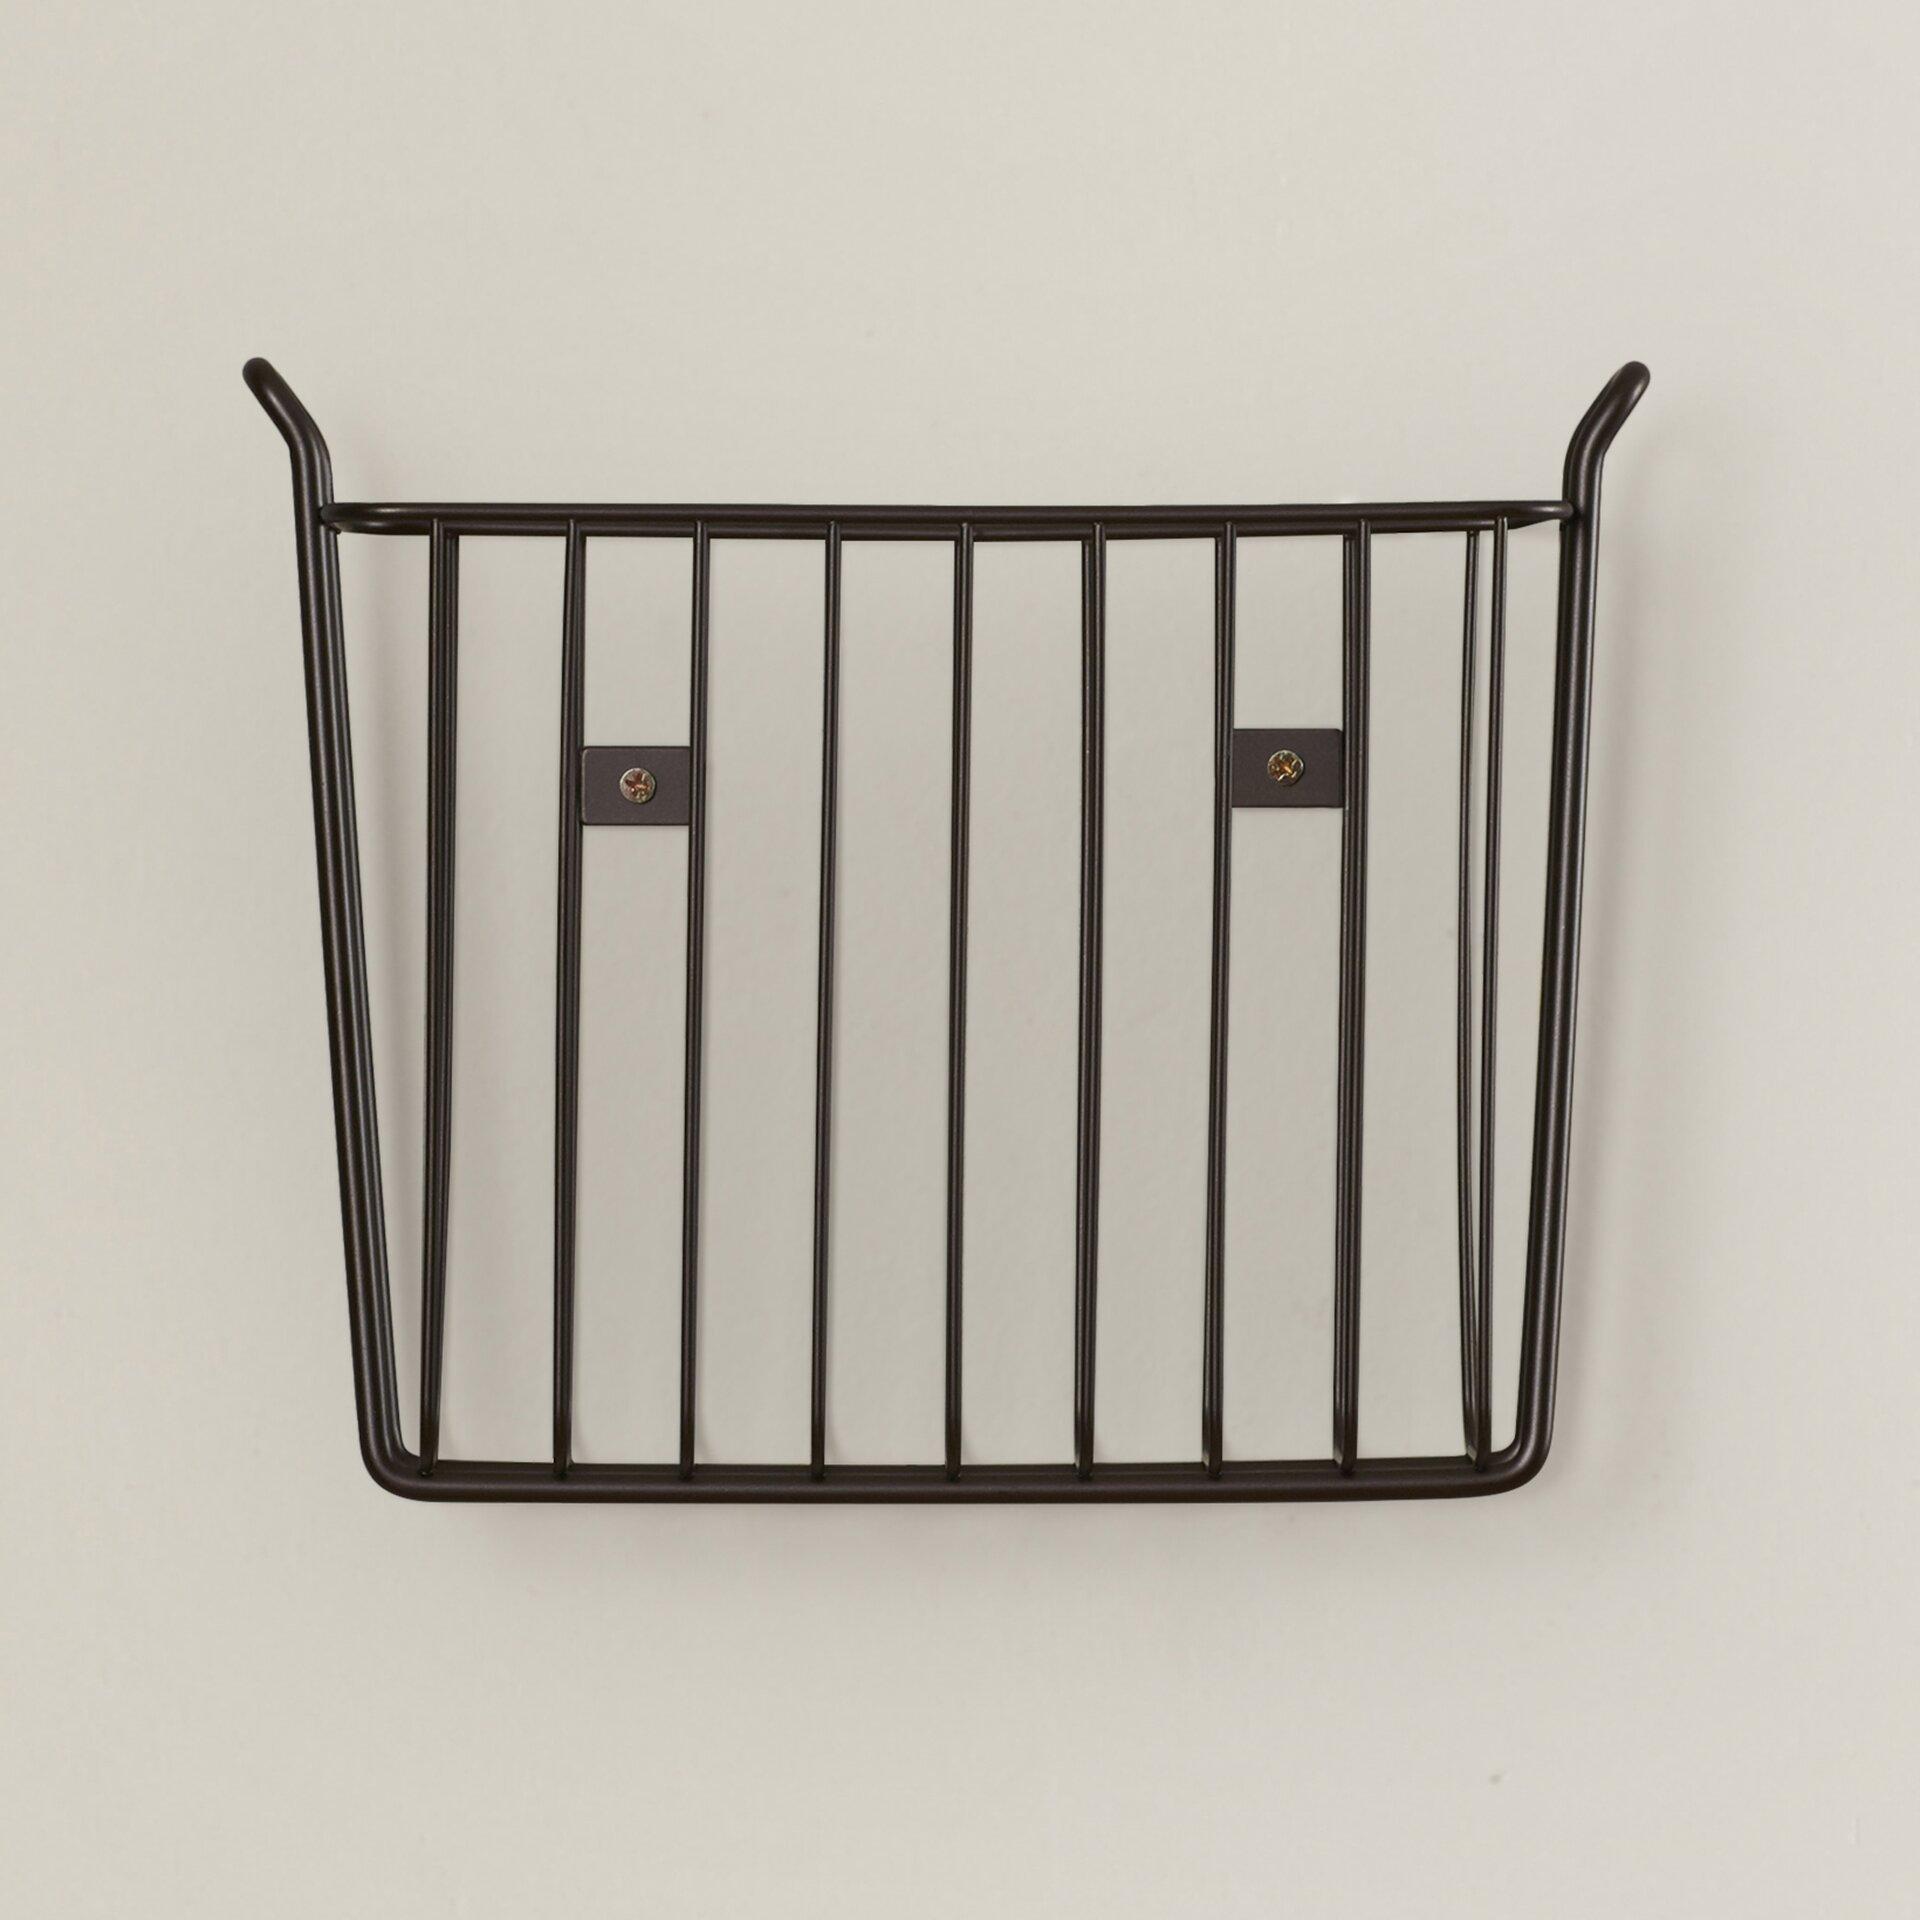 Crib for sale uk - Andover Mills Albreda Wallmount Magazine Rack Amp Reviews Wayfair